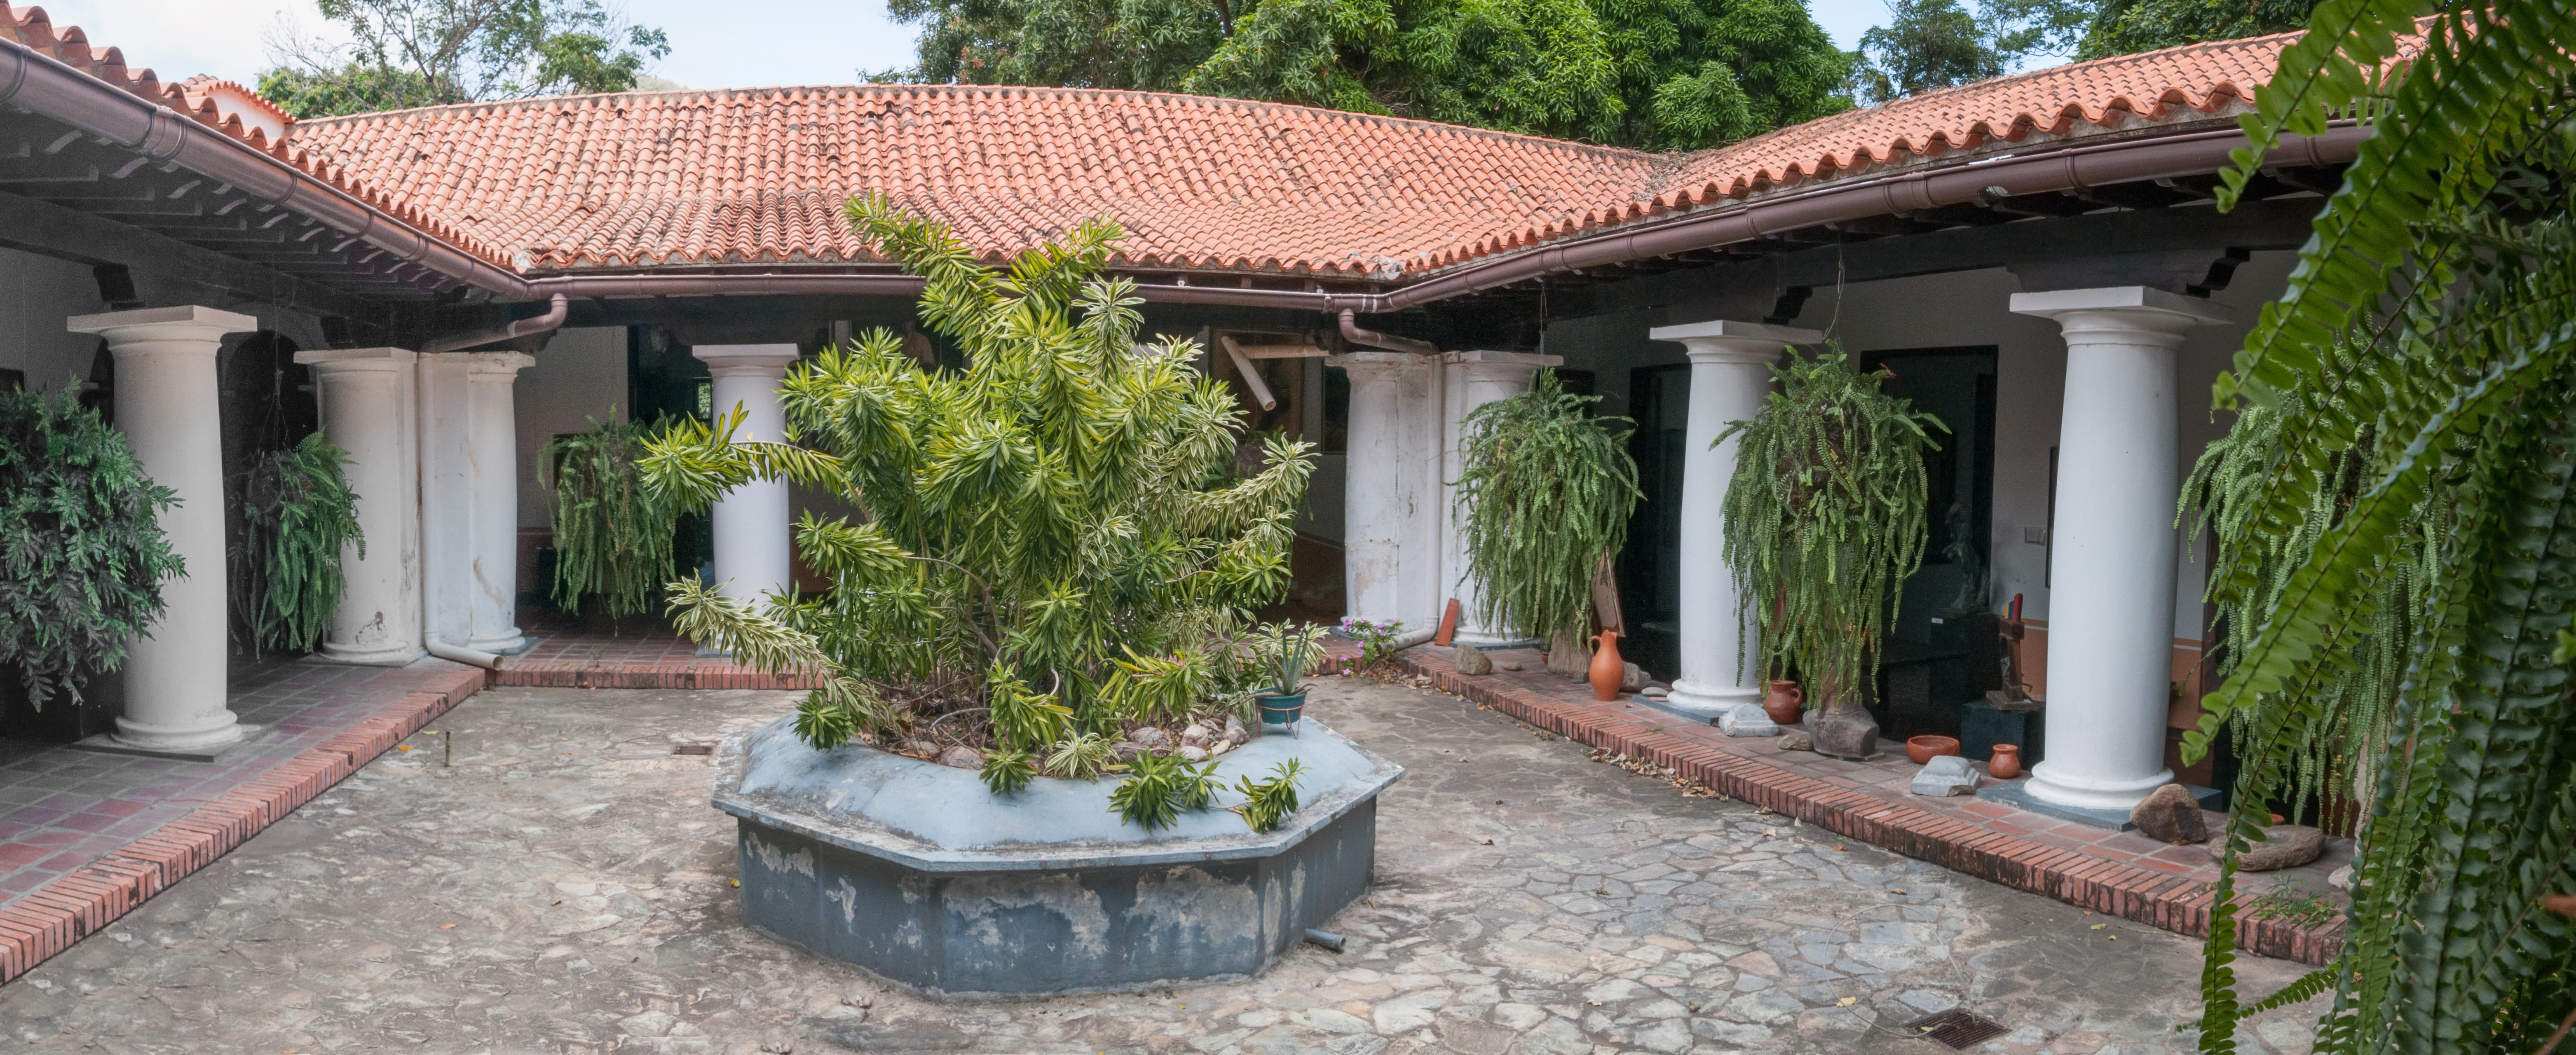 File patio interior da casa natal de santiago mari for Patios de casas